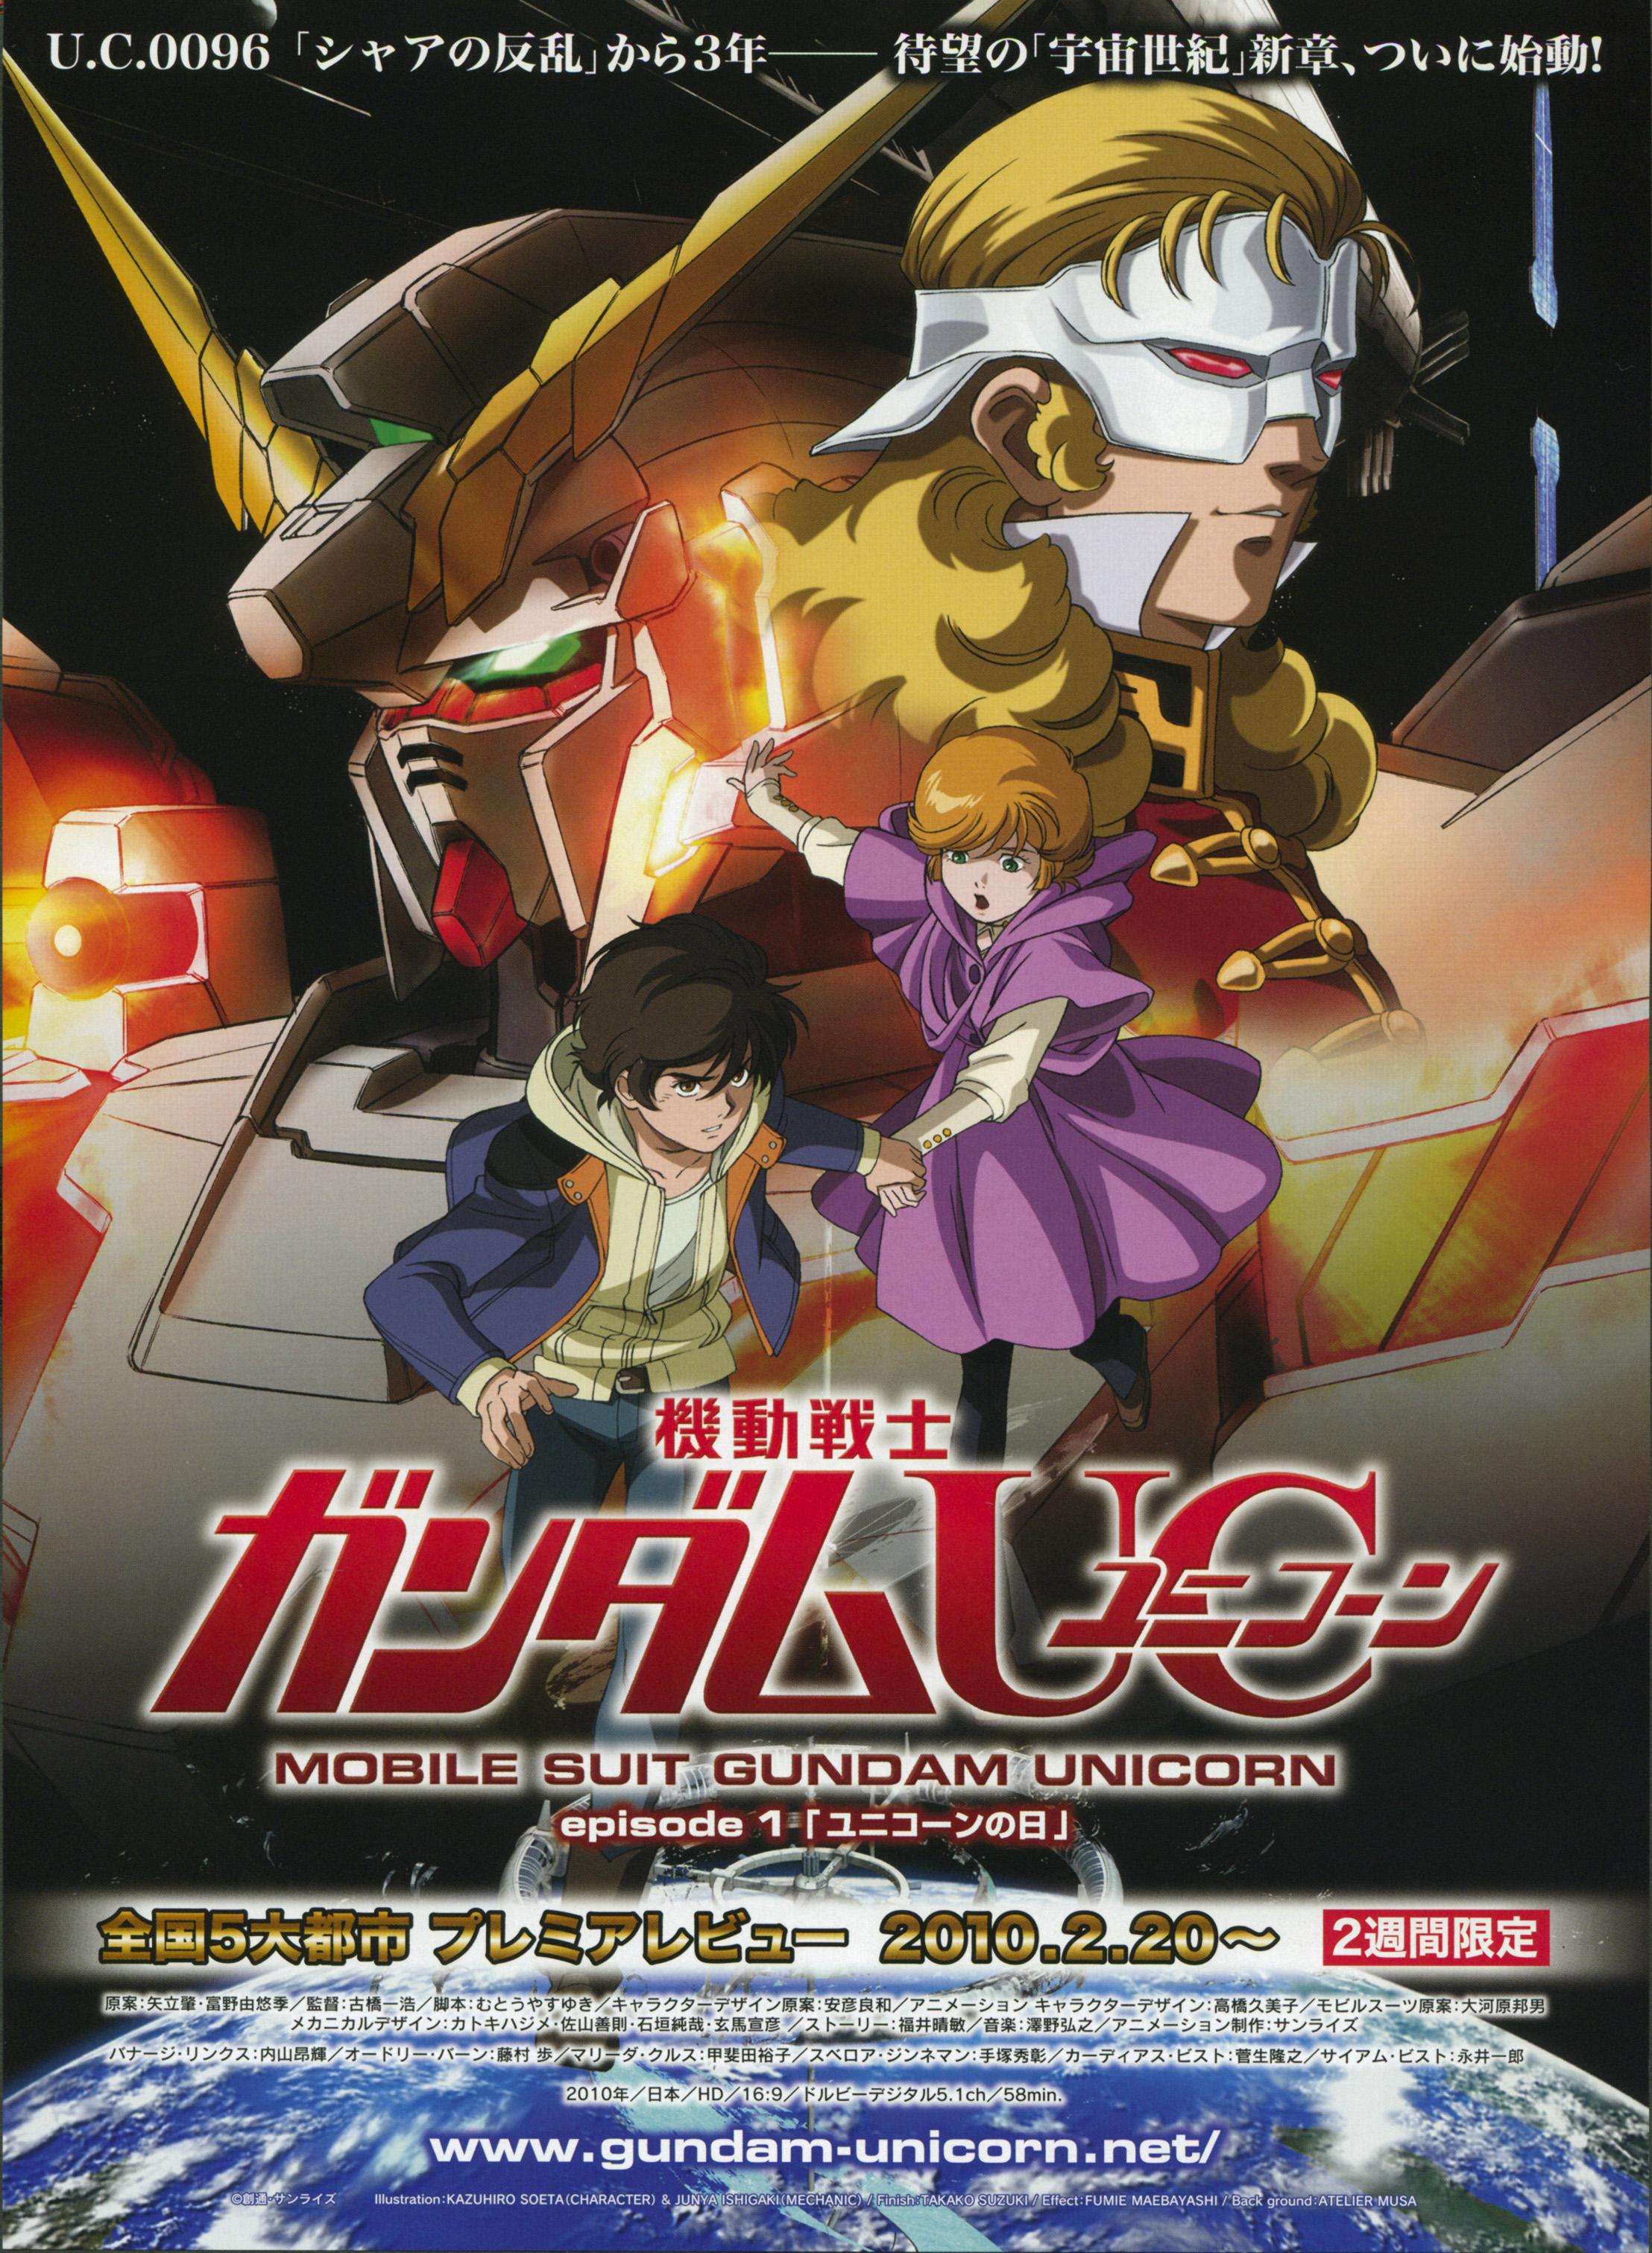 Mobile Suit Gundam Unicorn Episode 7 Over the Rainbow haruhichan.com gundam unicorn visual